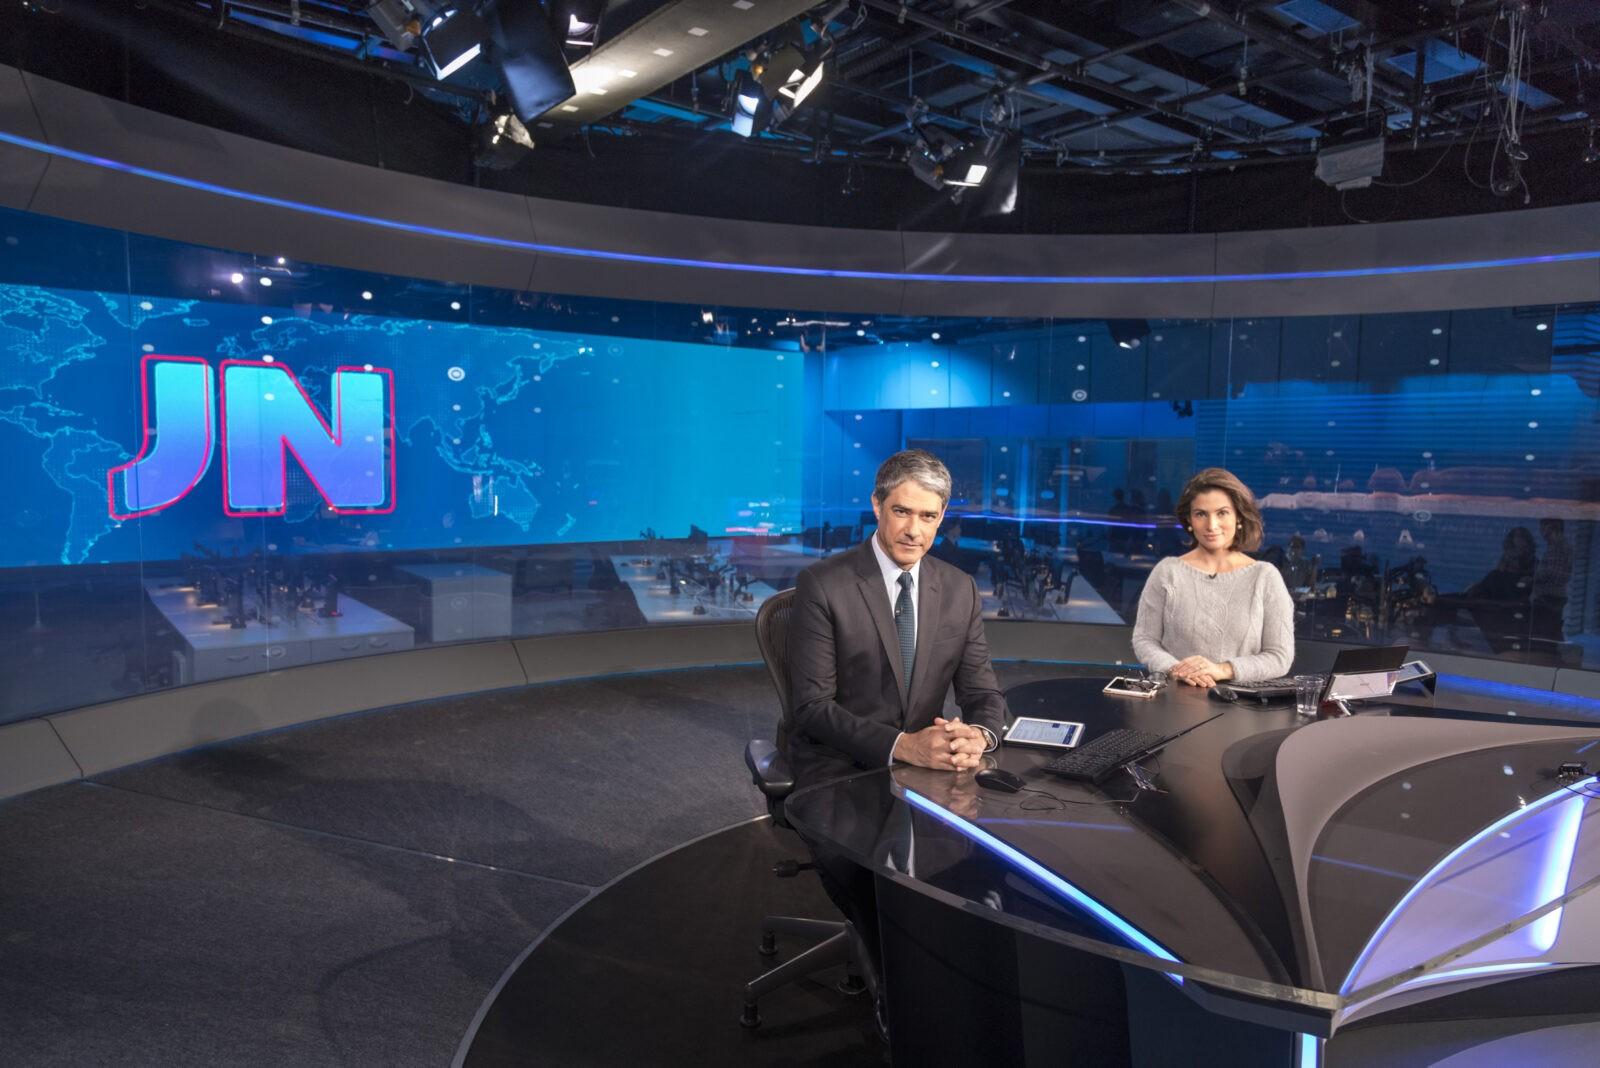 Foto: William Bonner e Renata Vasconcellos no novo estúdio do 'Jornal Nacional'. Crédito: Globo/Sergio Zalis